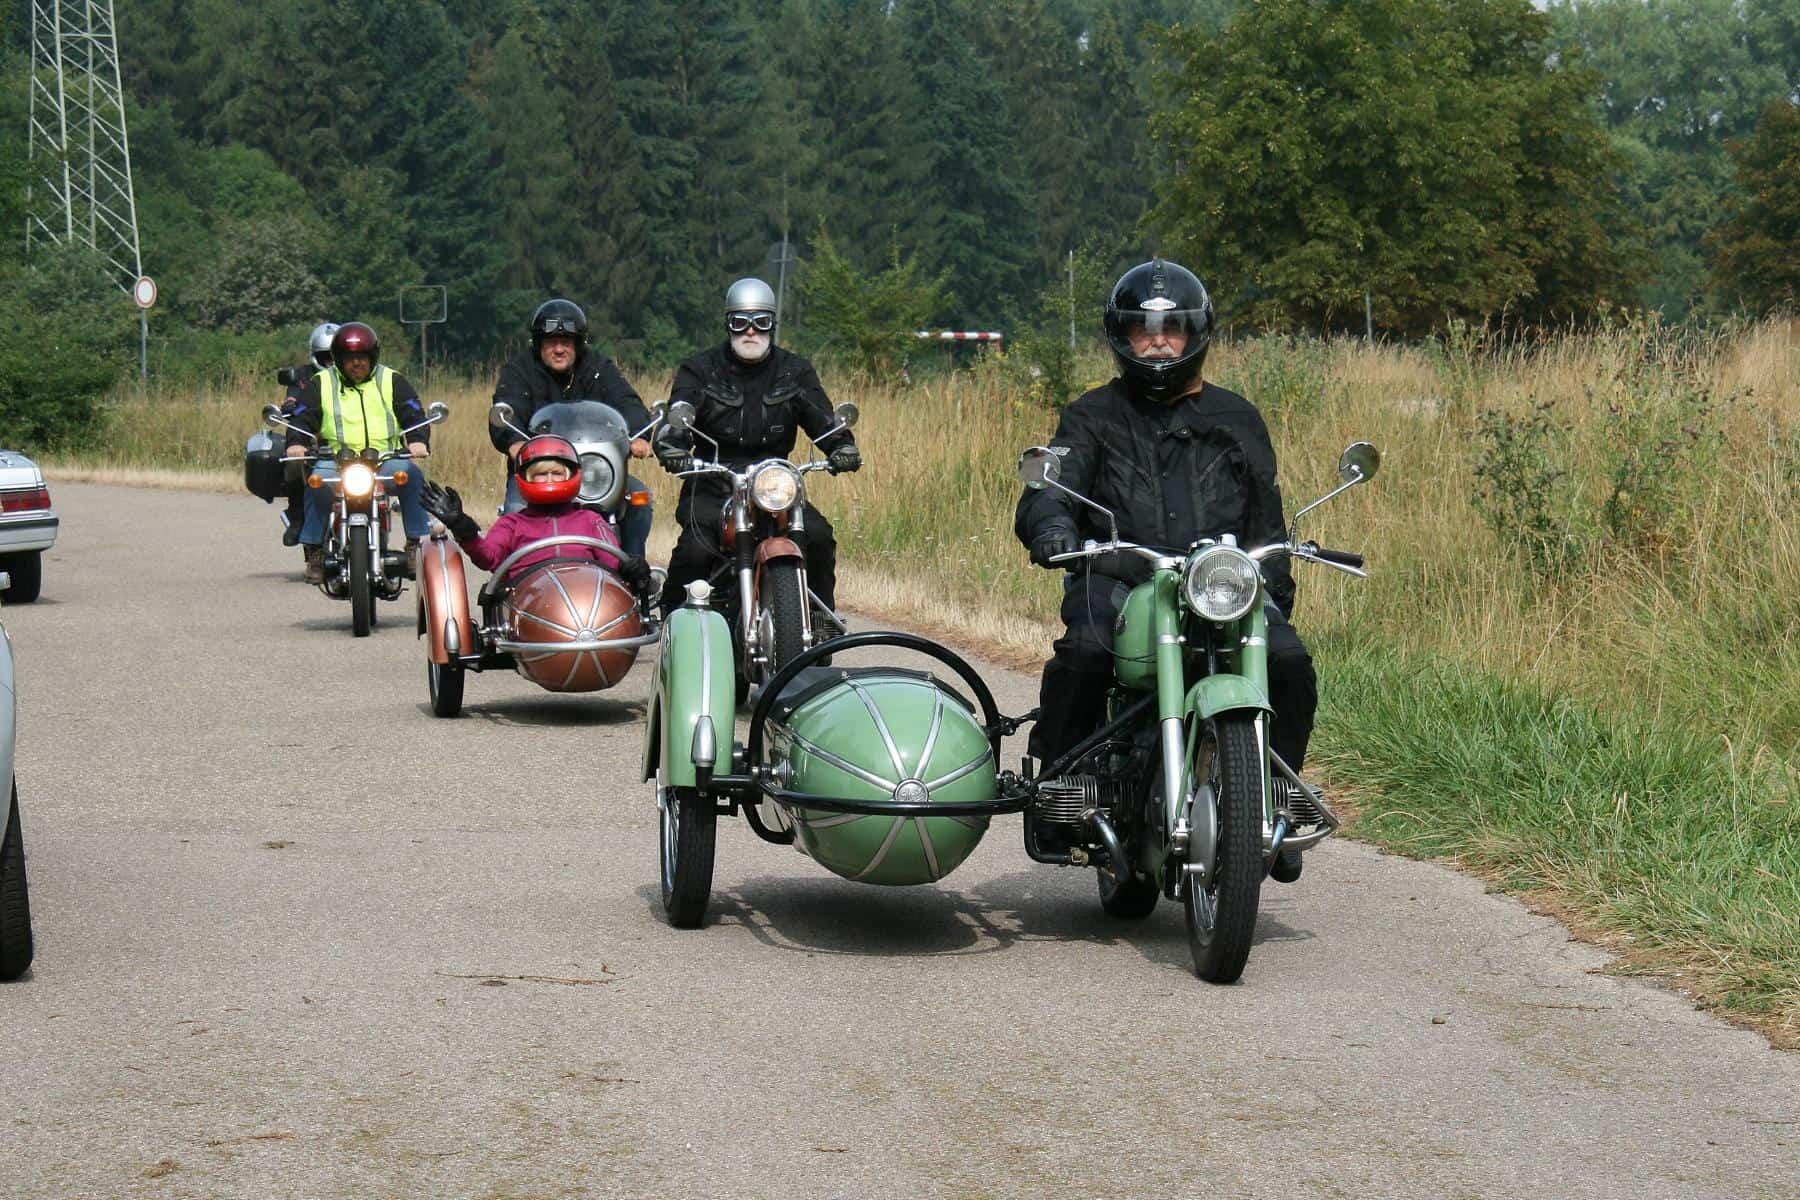 Oldtimer-Motorradfahrt am 15. August am Domplatz